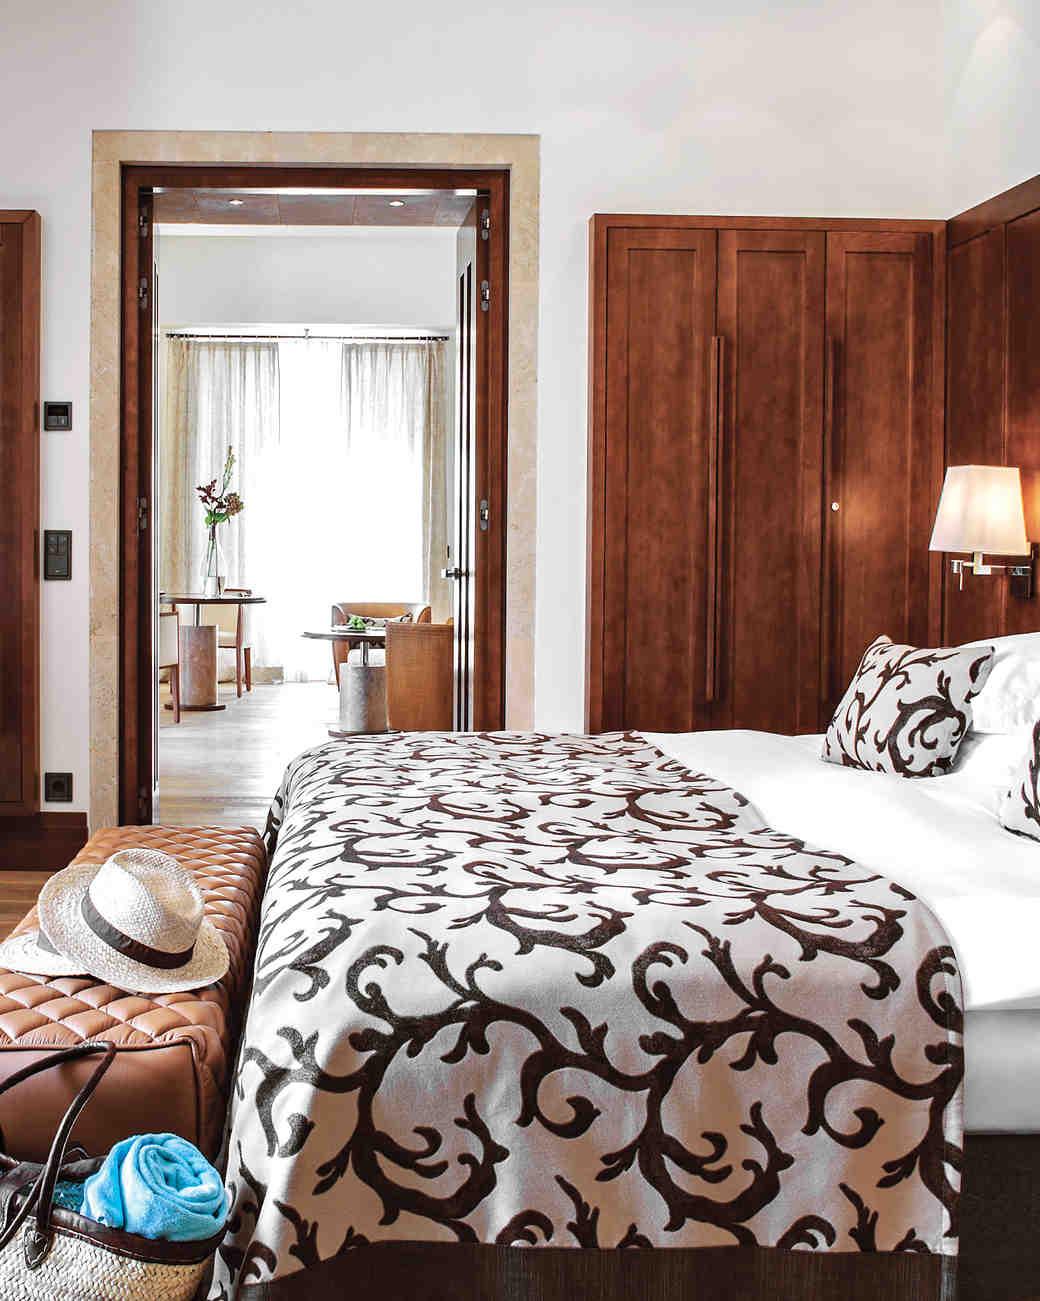 hotel-bed-luxury-52020849-h1--dsc100-ds111324.jpg